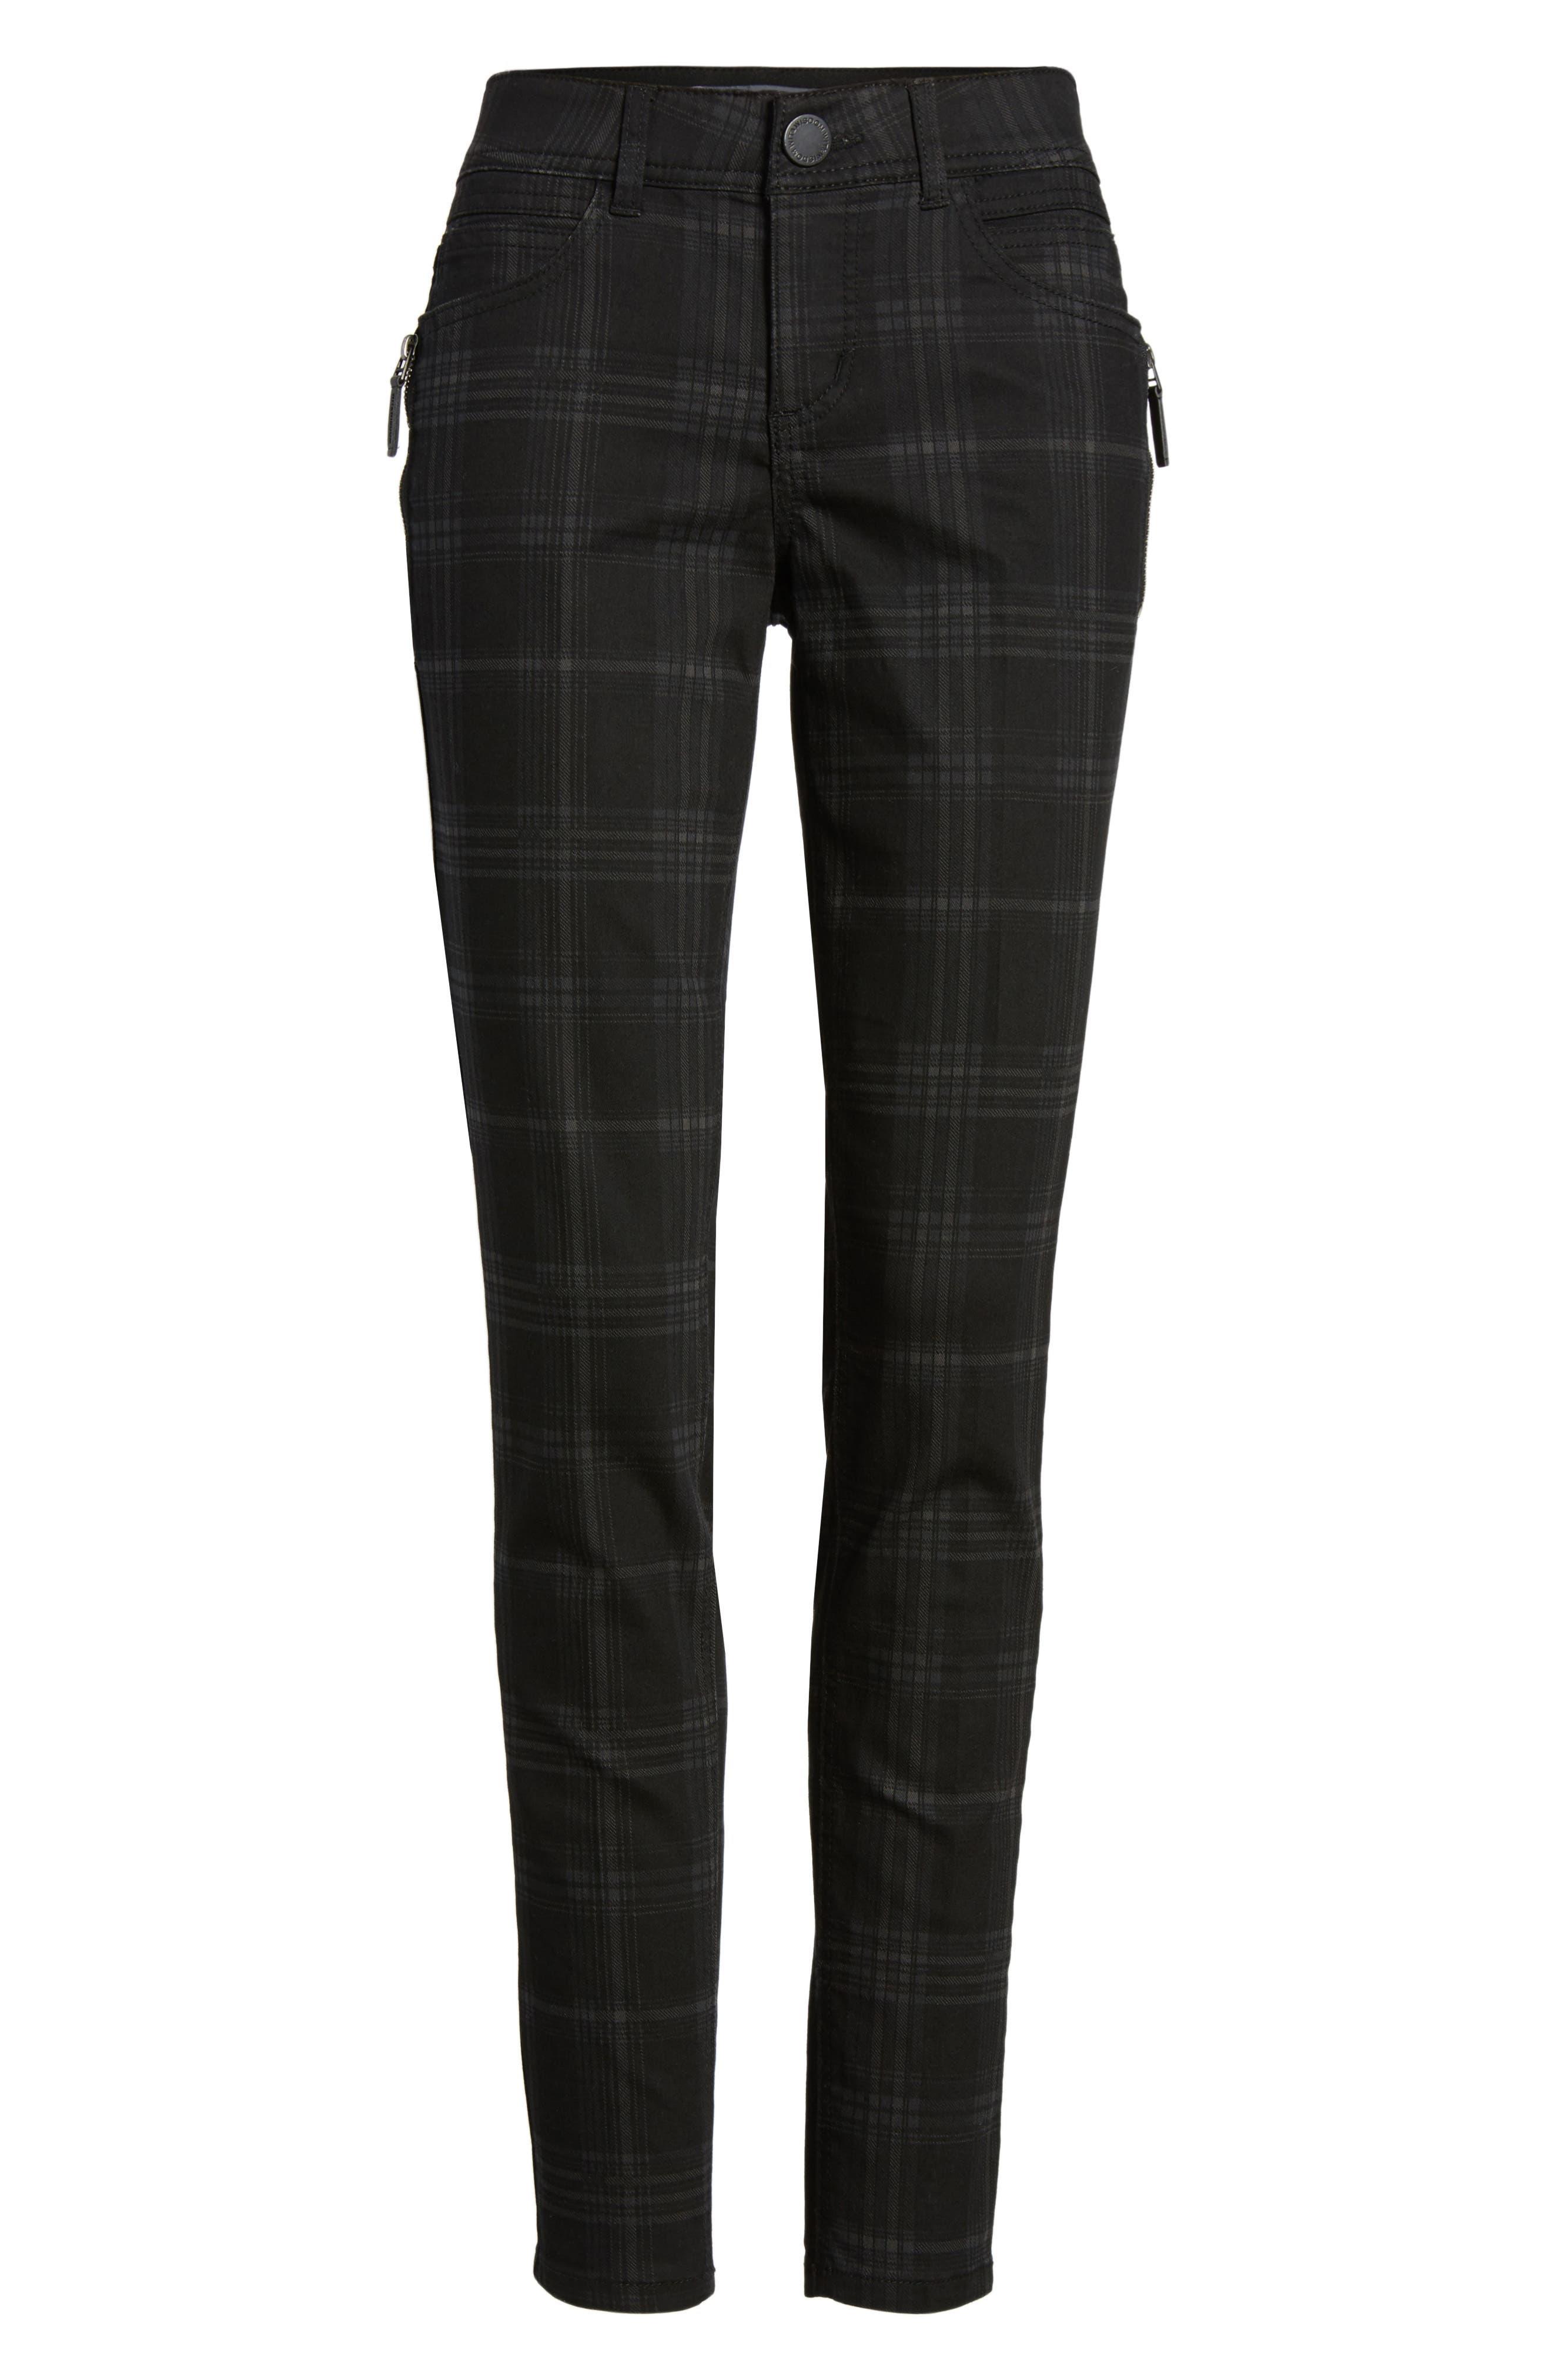 WIT & WISDOM, Ab-solution Side Zip Plaid Skinny Pants, Alternate thumbnail 7, color, BLACK